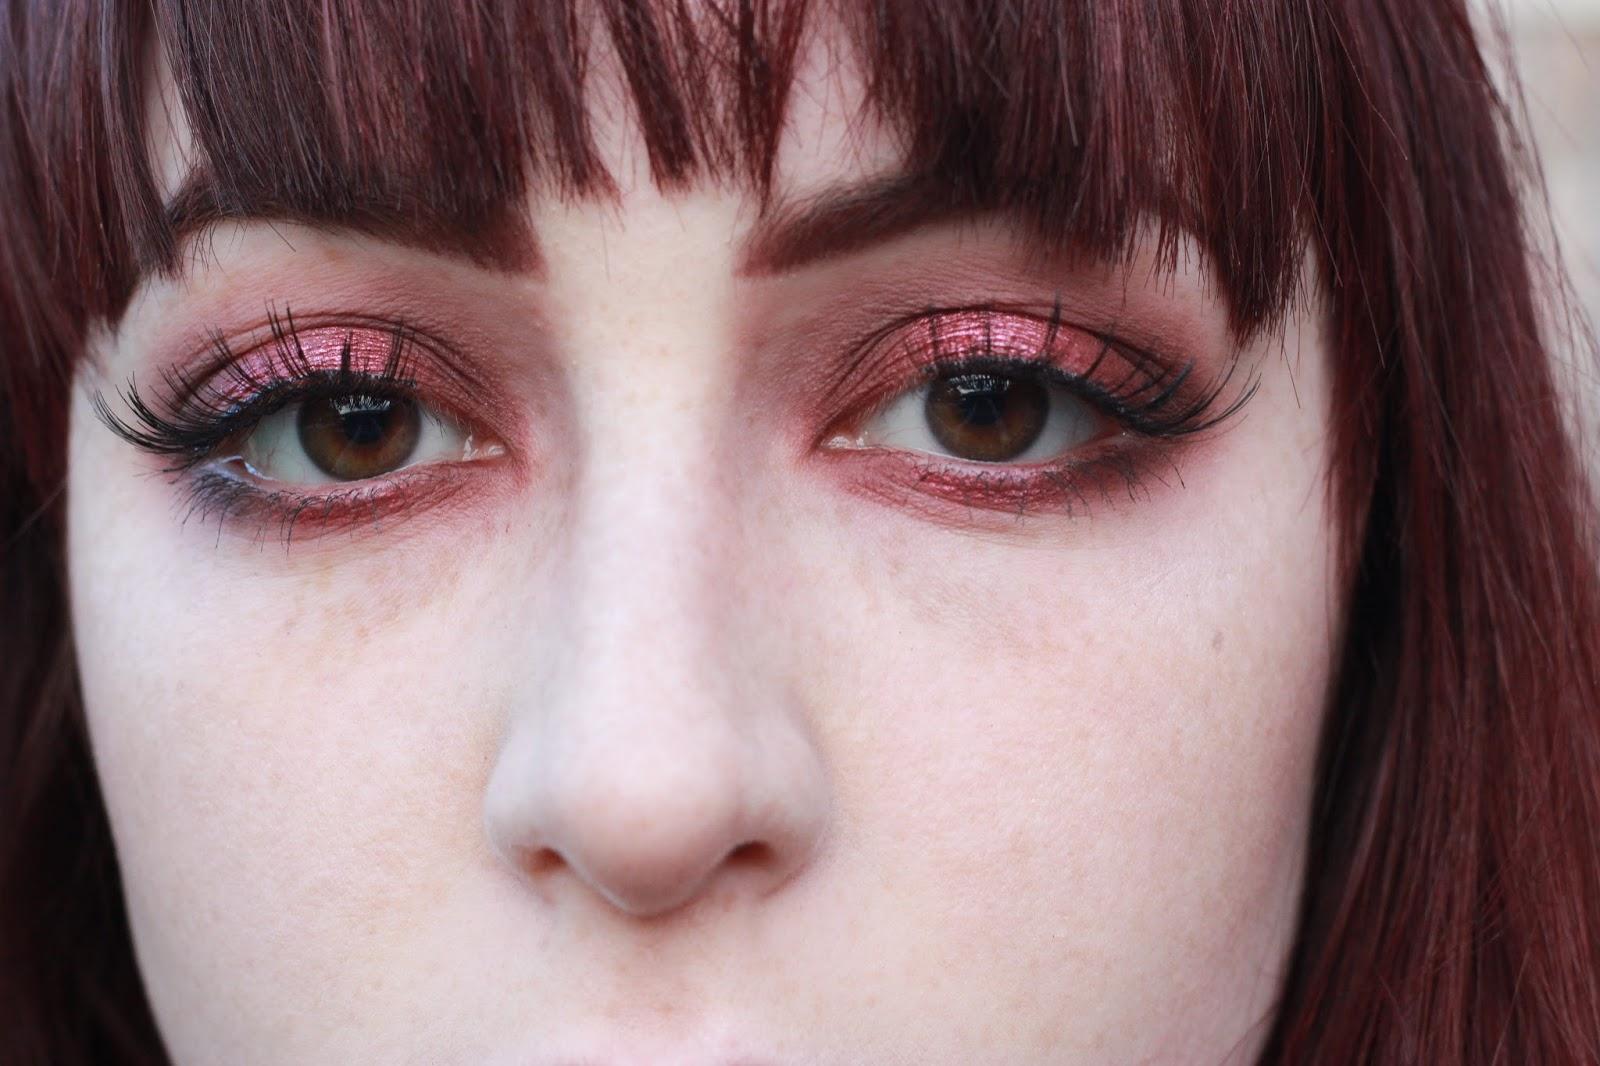 Maybelline Color Tattoo Cream Eyeshadow: Vintage Plum